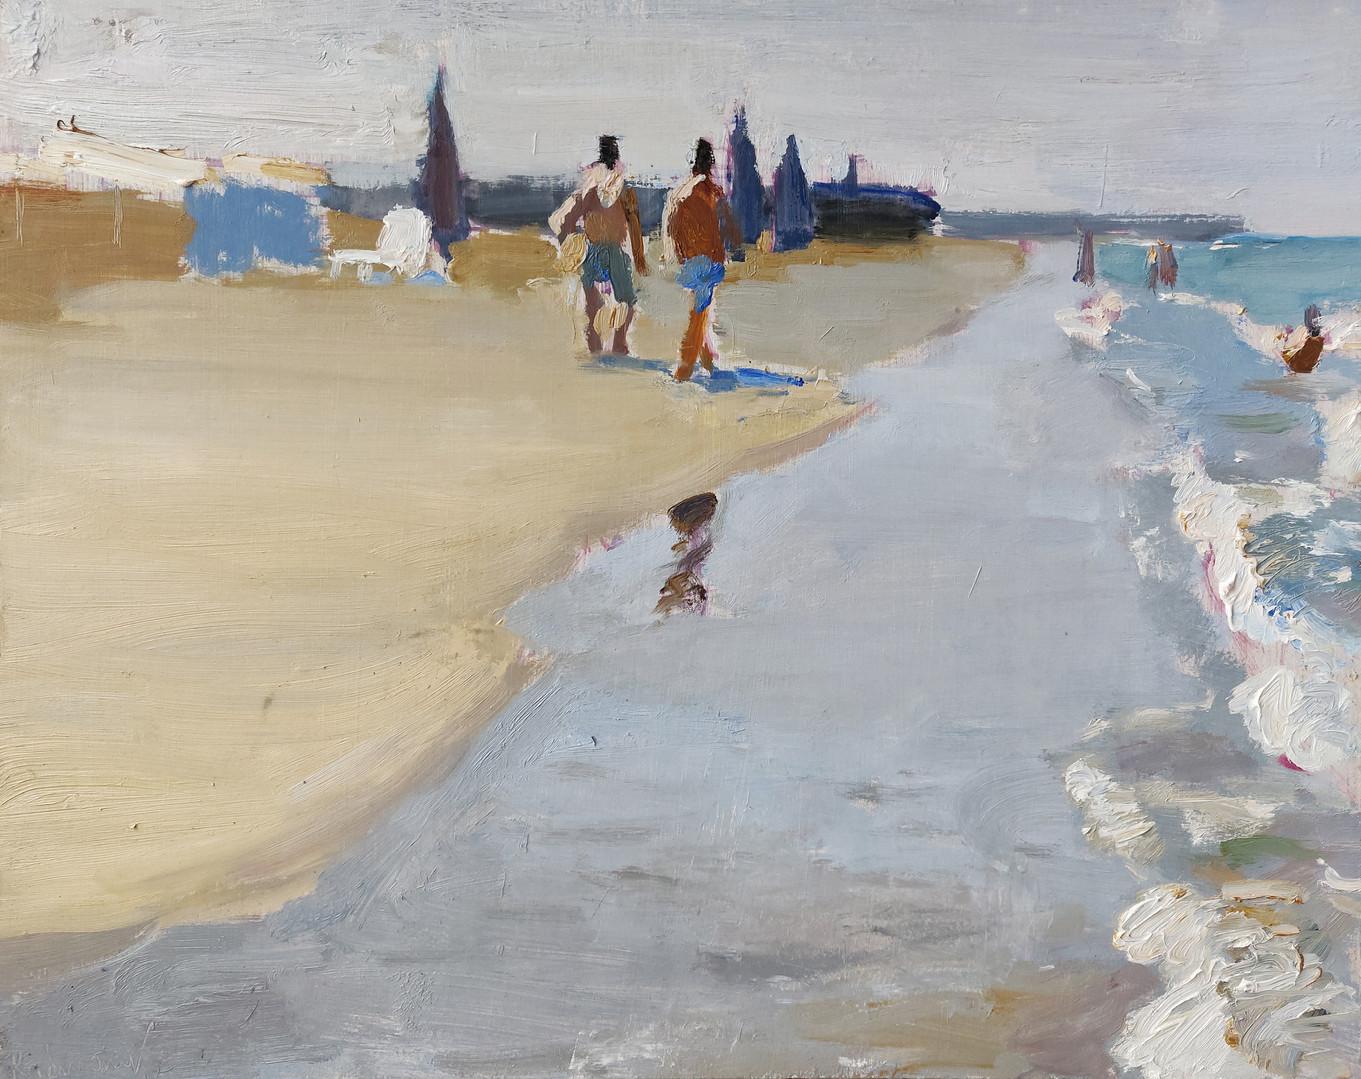 The Russian Ark_Samir Rakhmanov_At the Beach